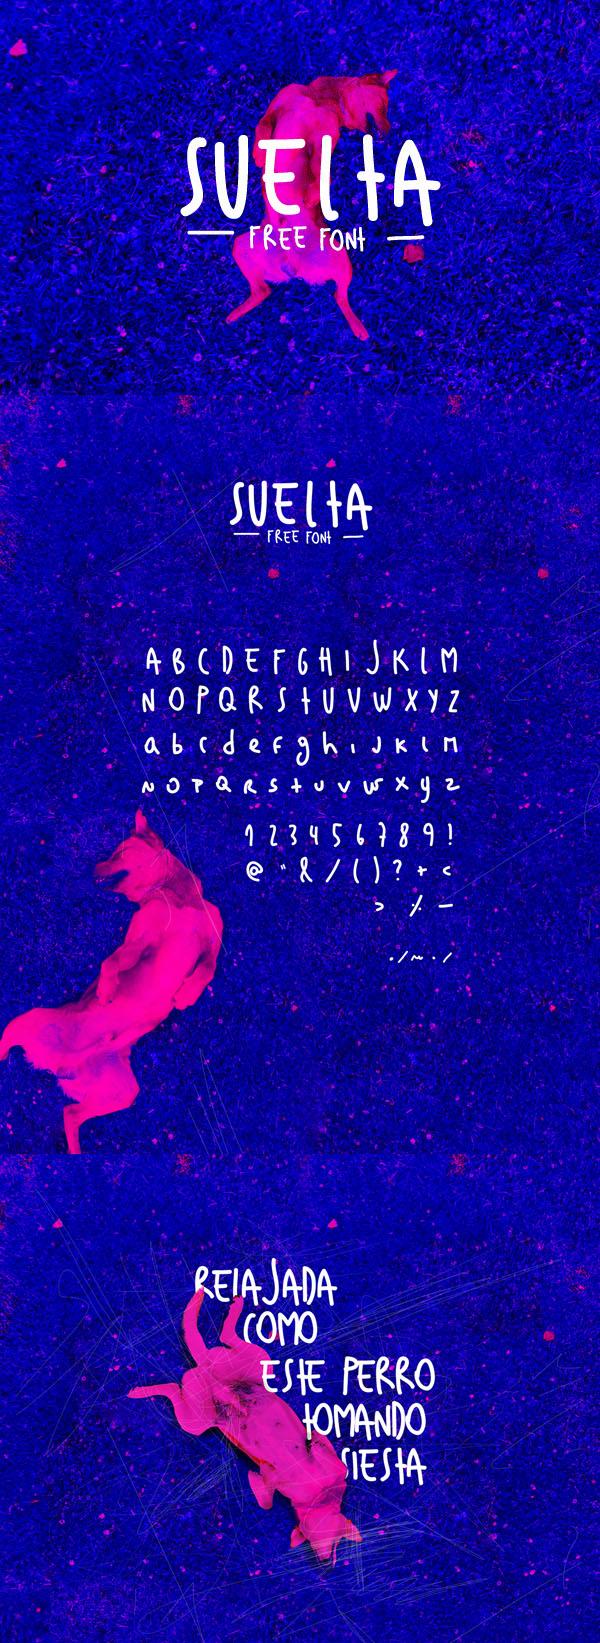 03 Suelta Free Font